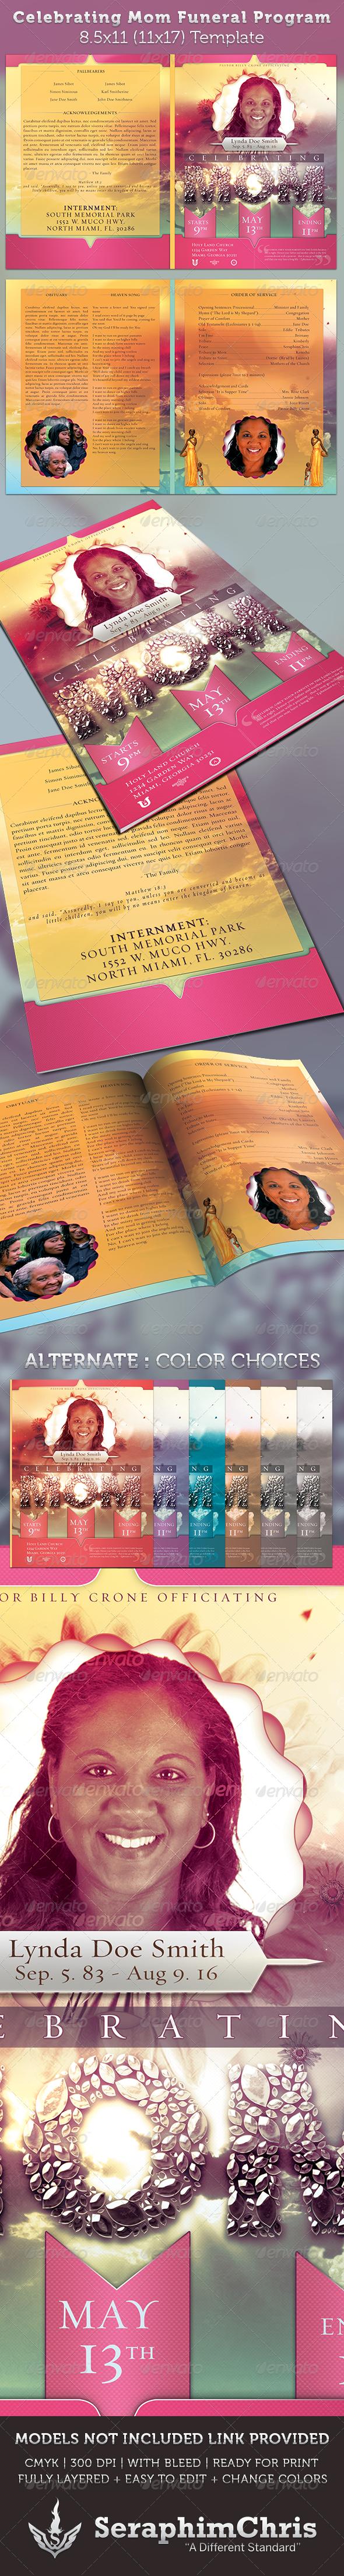 Celebrating Mom Funeral Program Template - Informational Brochures